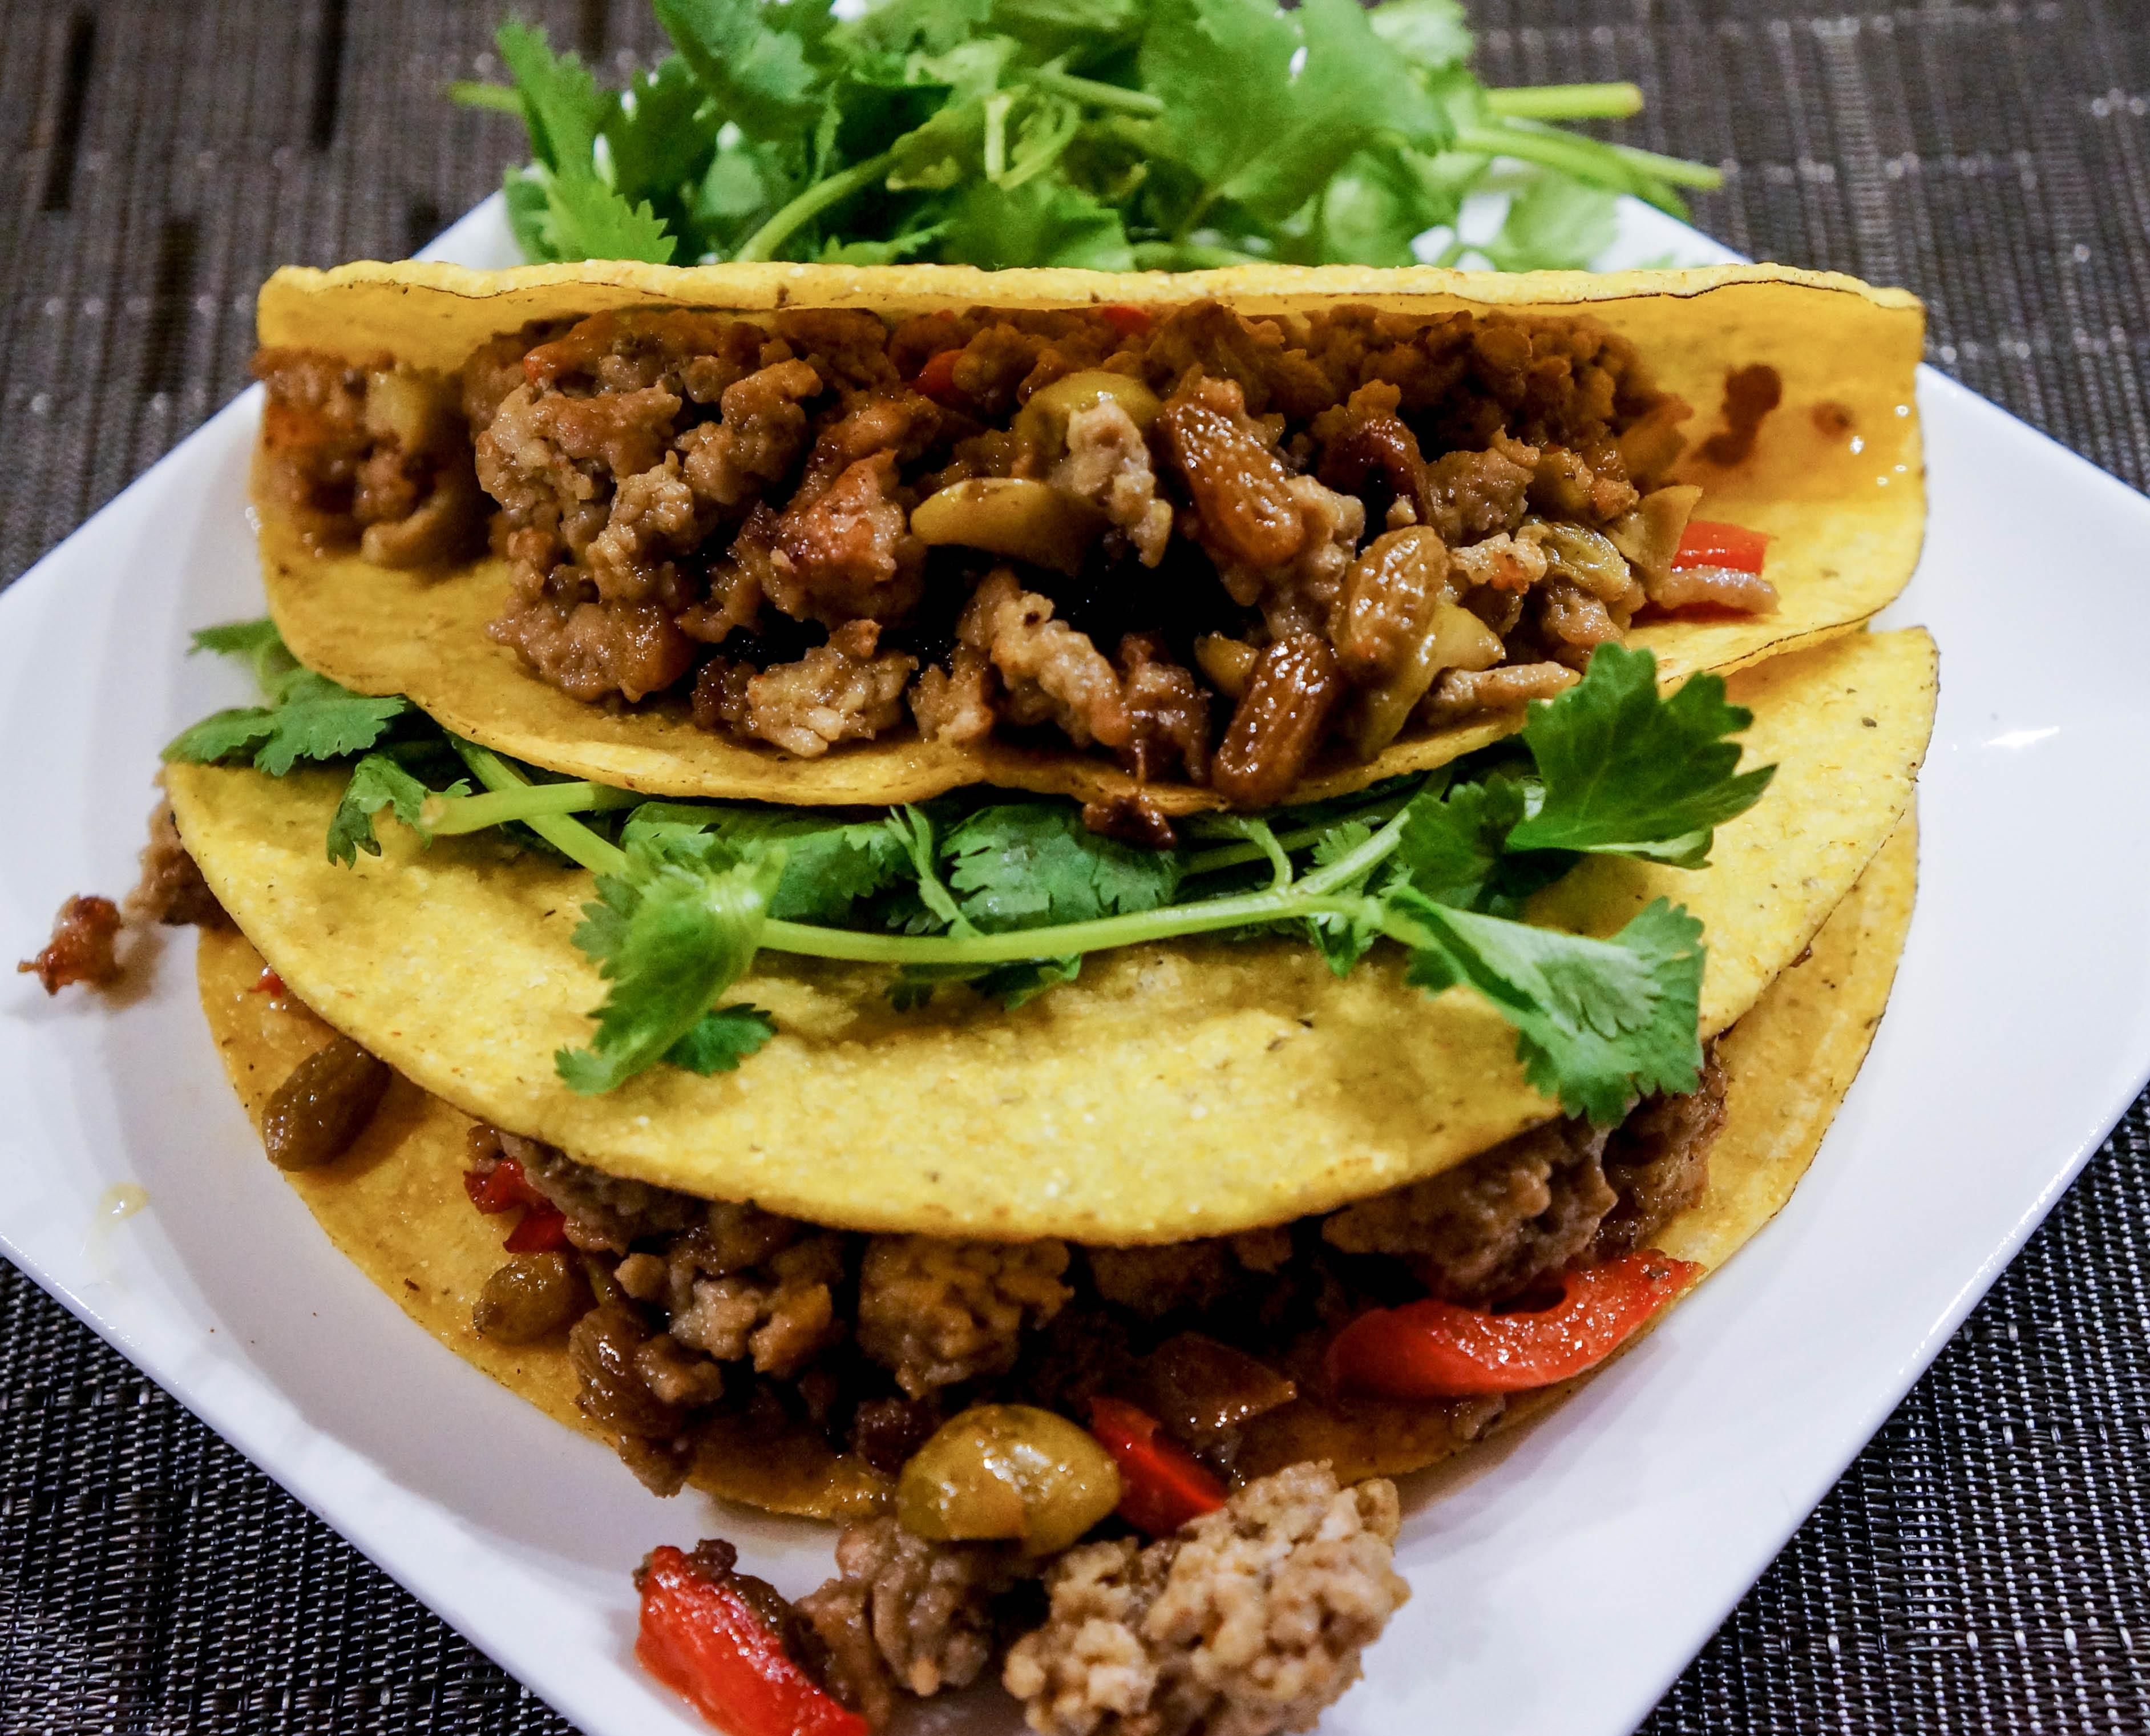 Tacos Hd 3768x3042 Download Hd Wallpaper Wallpapertip